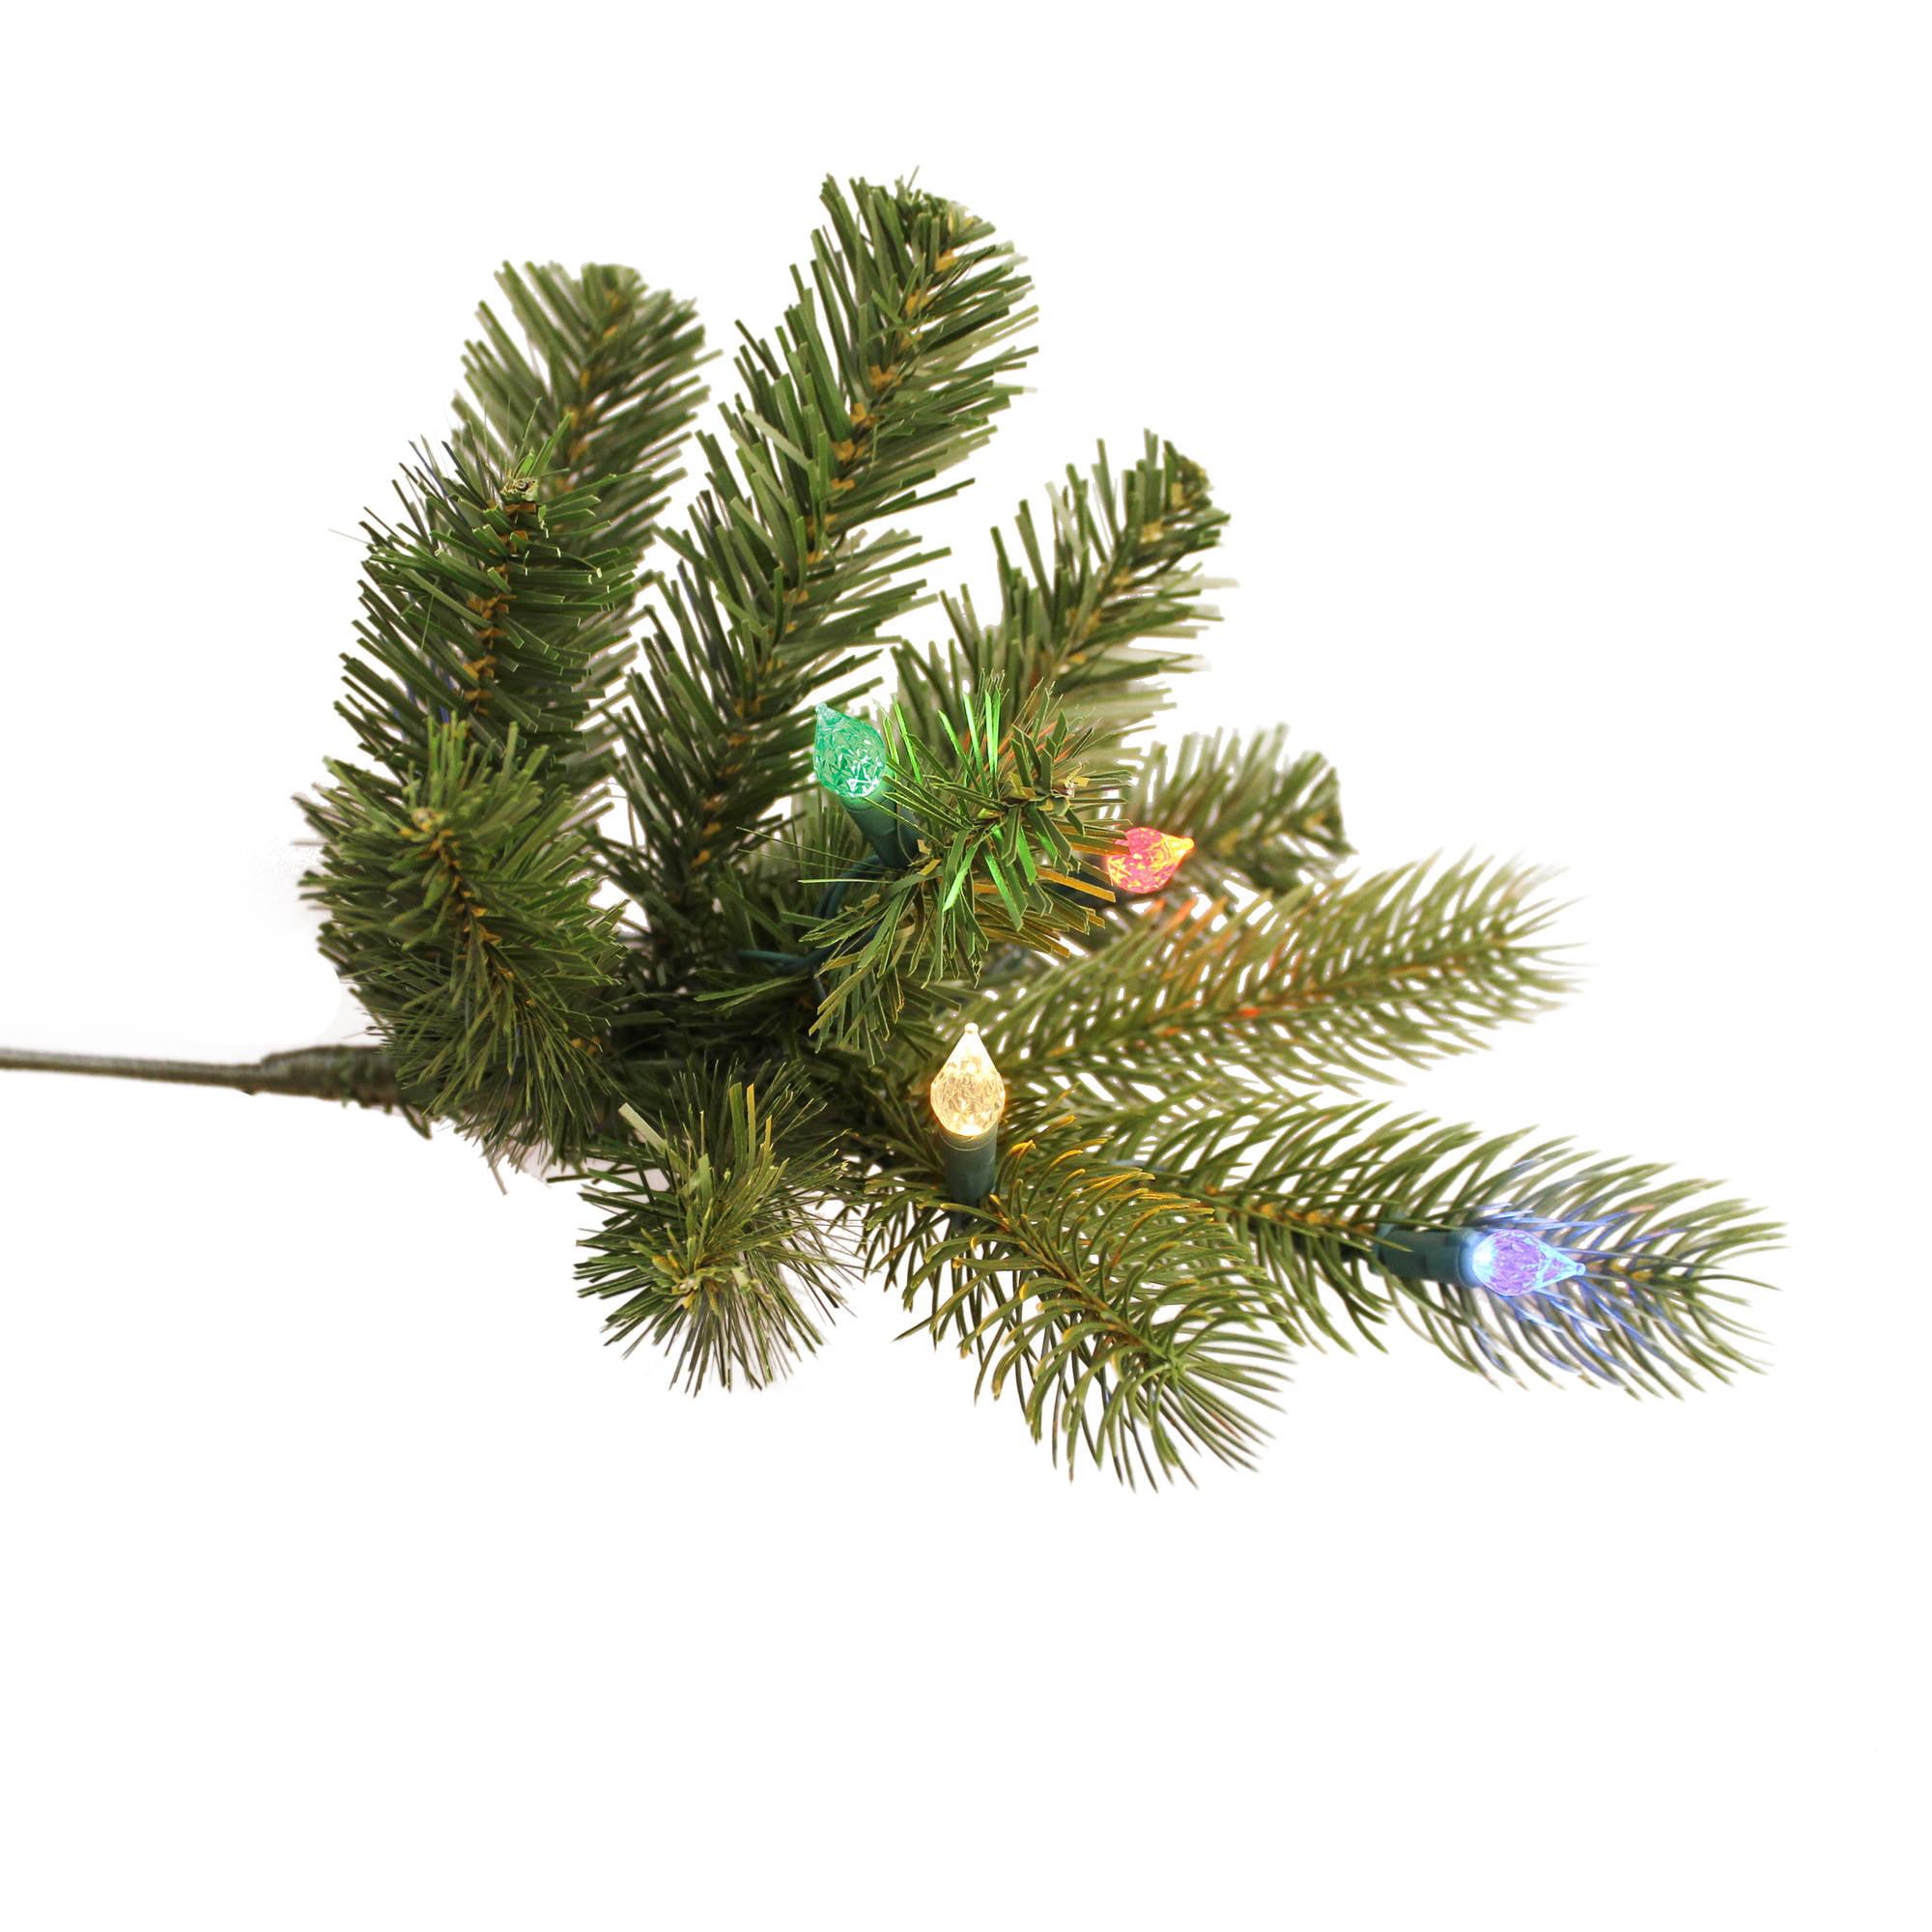 Ge Prelit Christmas Trees | Home Decorating, Interior Design, Bath ...